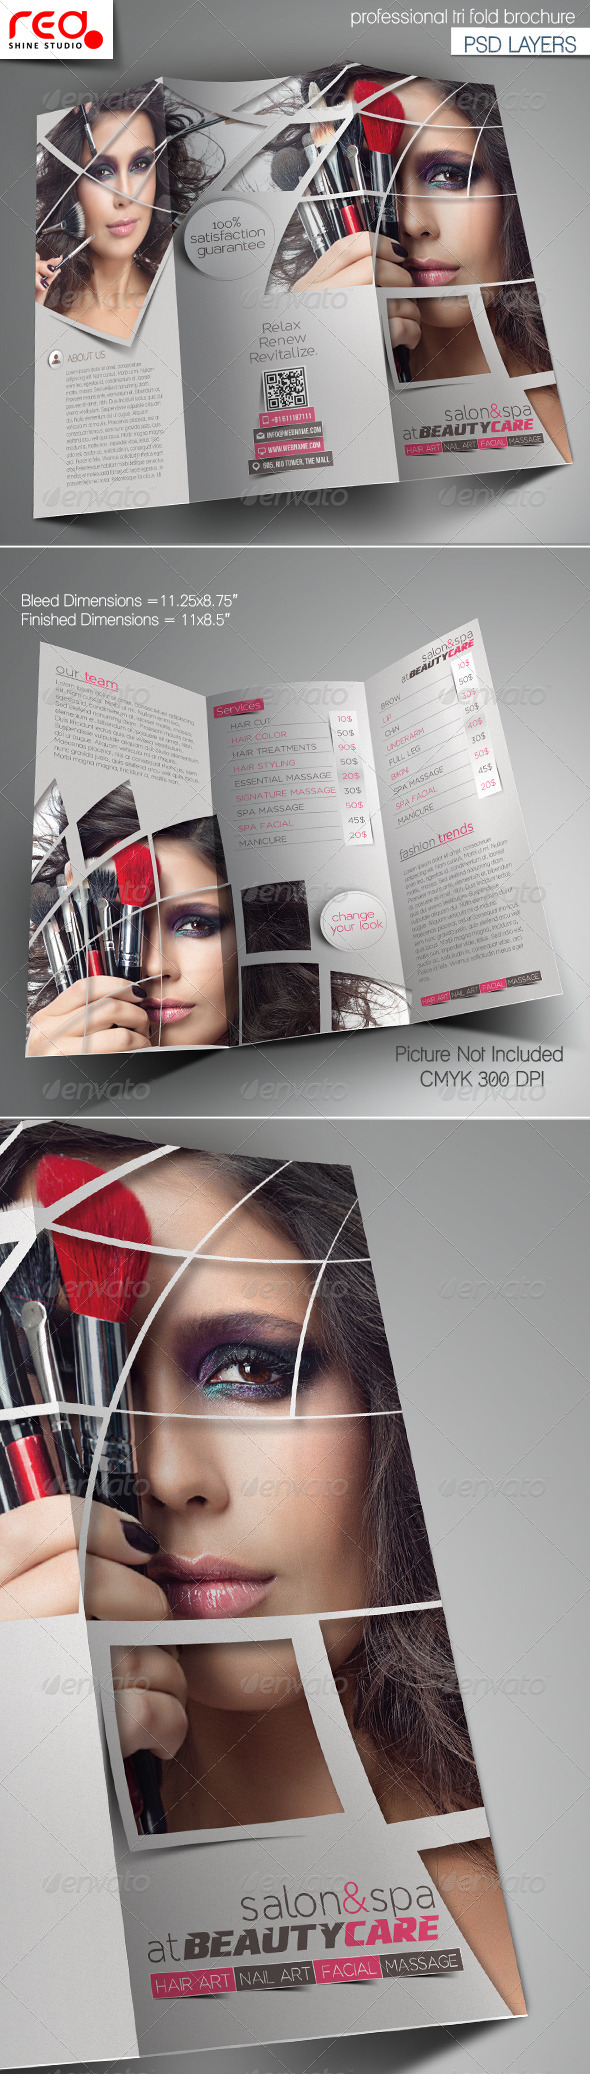 GraphicRiver Beauty Care & Salon Trifold Brochure Template 7570292